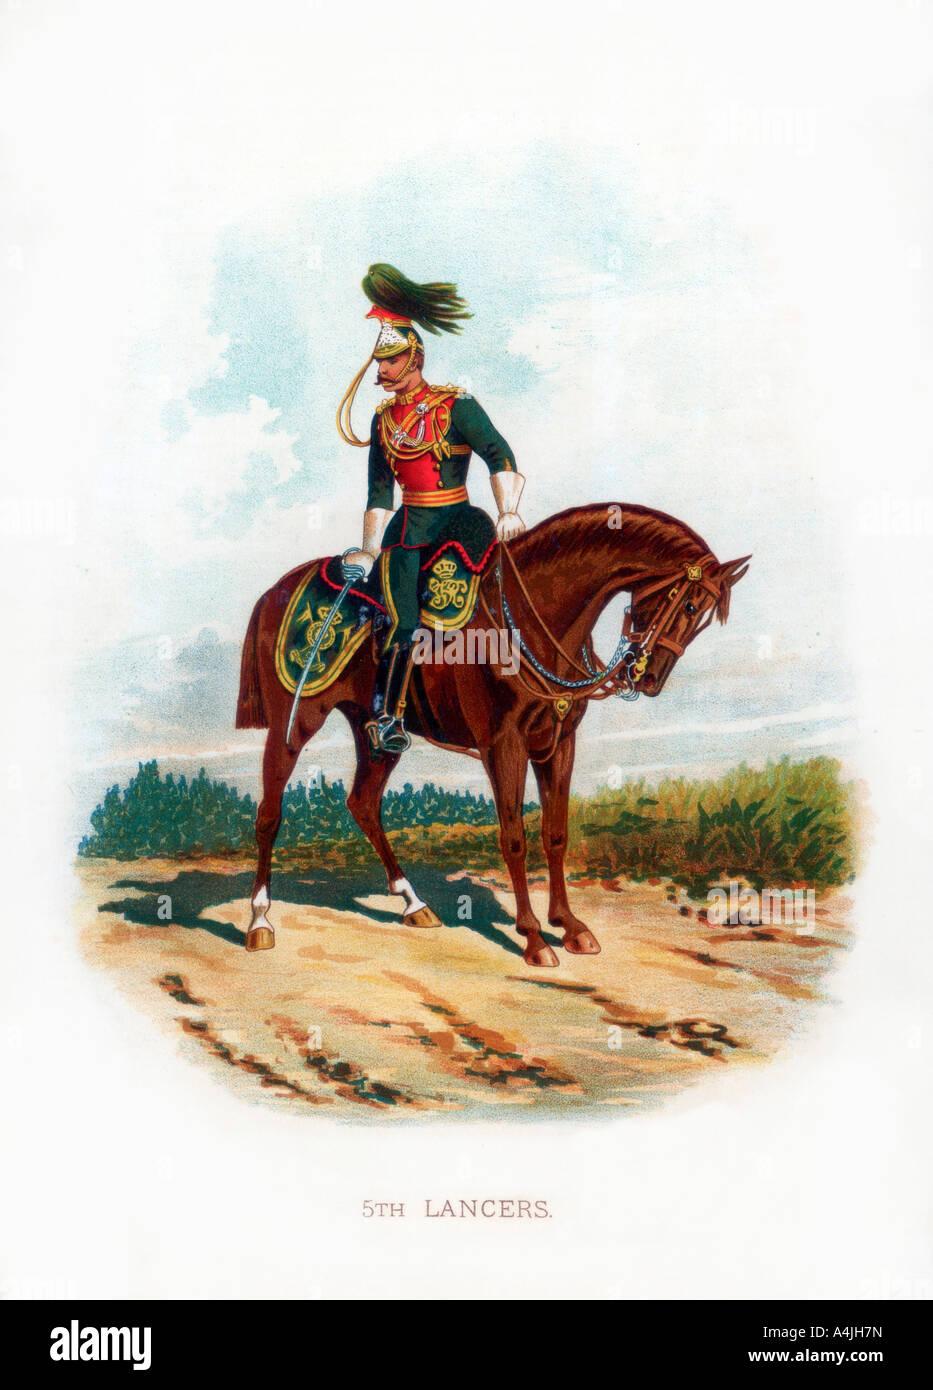 5th Lancers 1889  - Stock Image